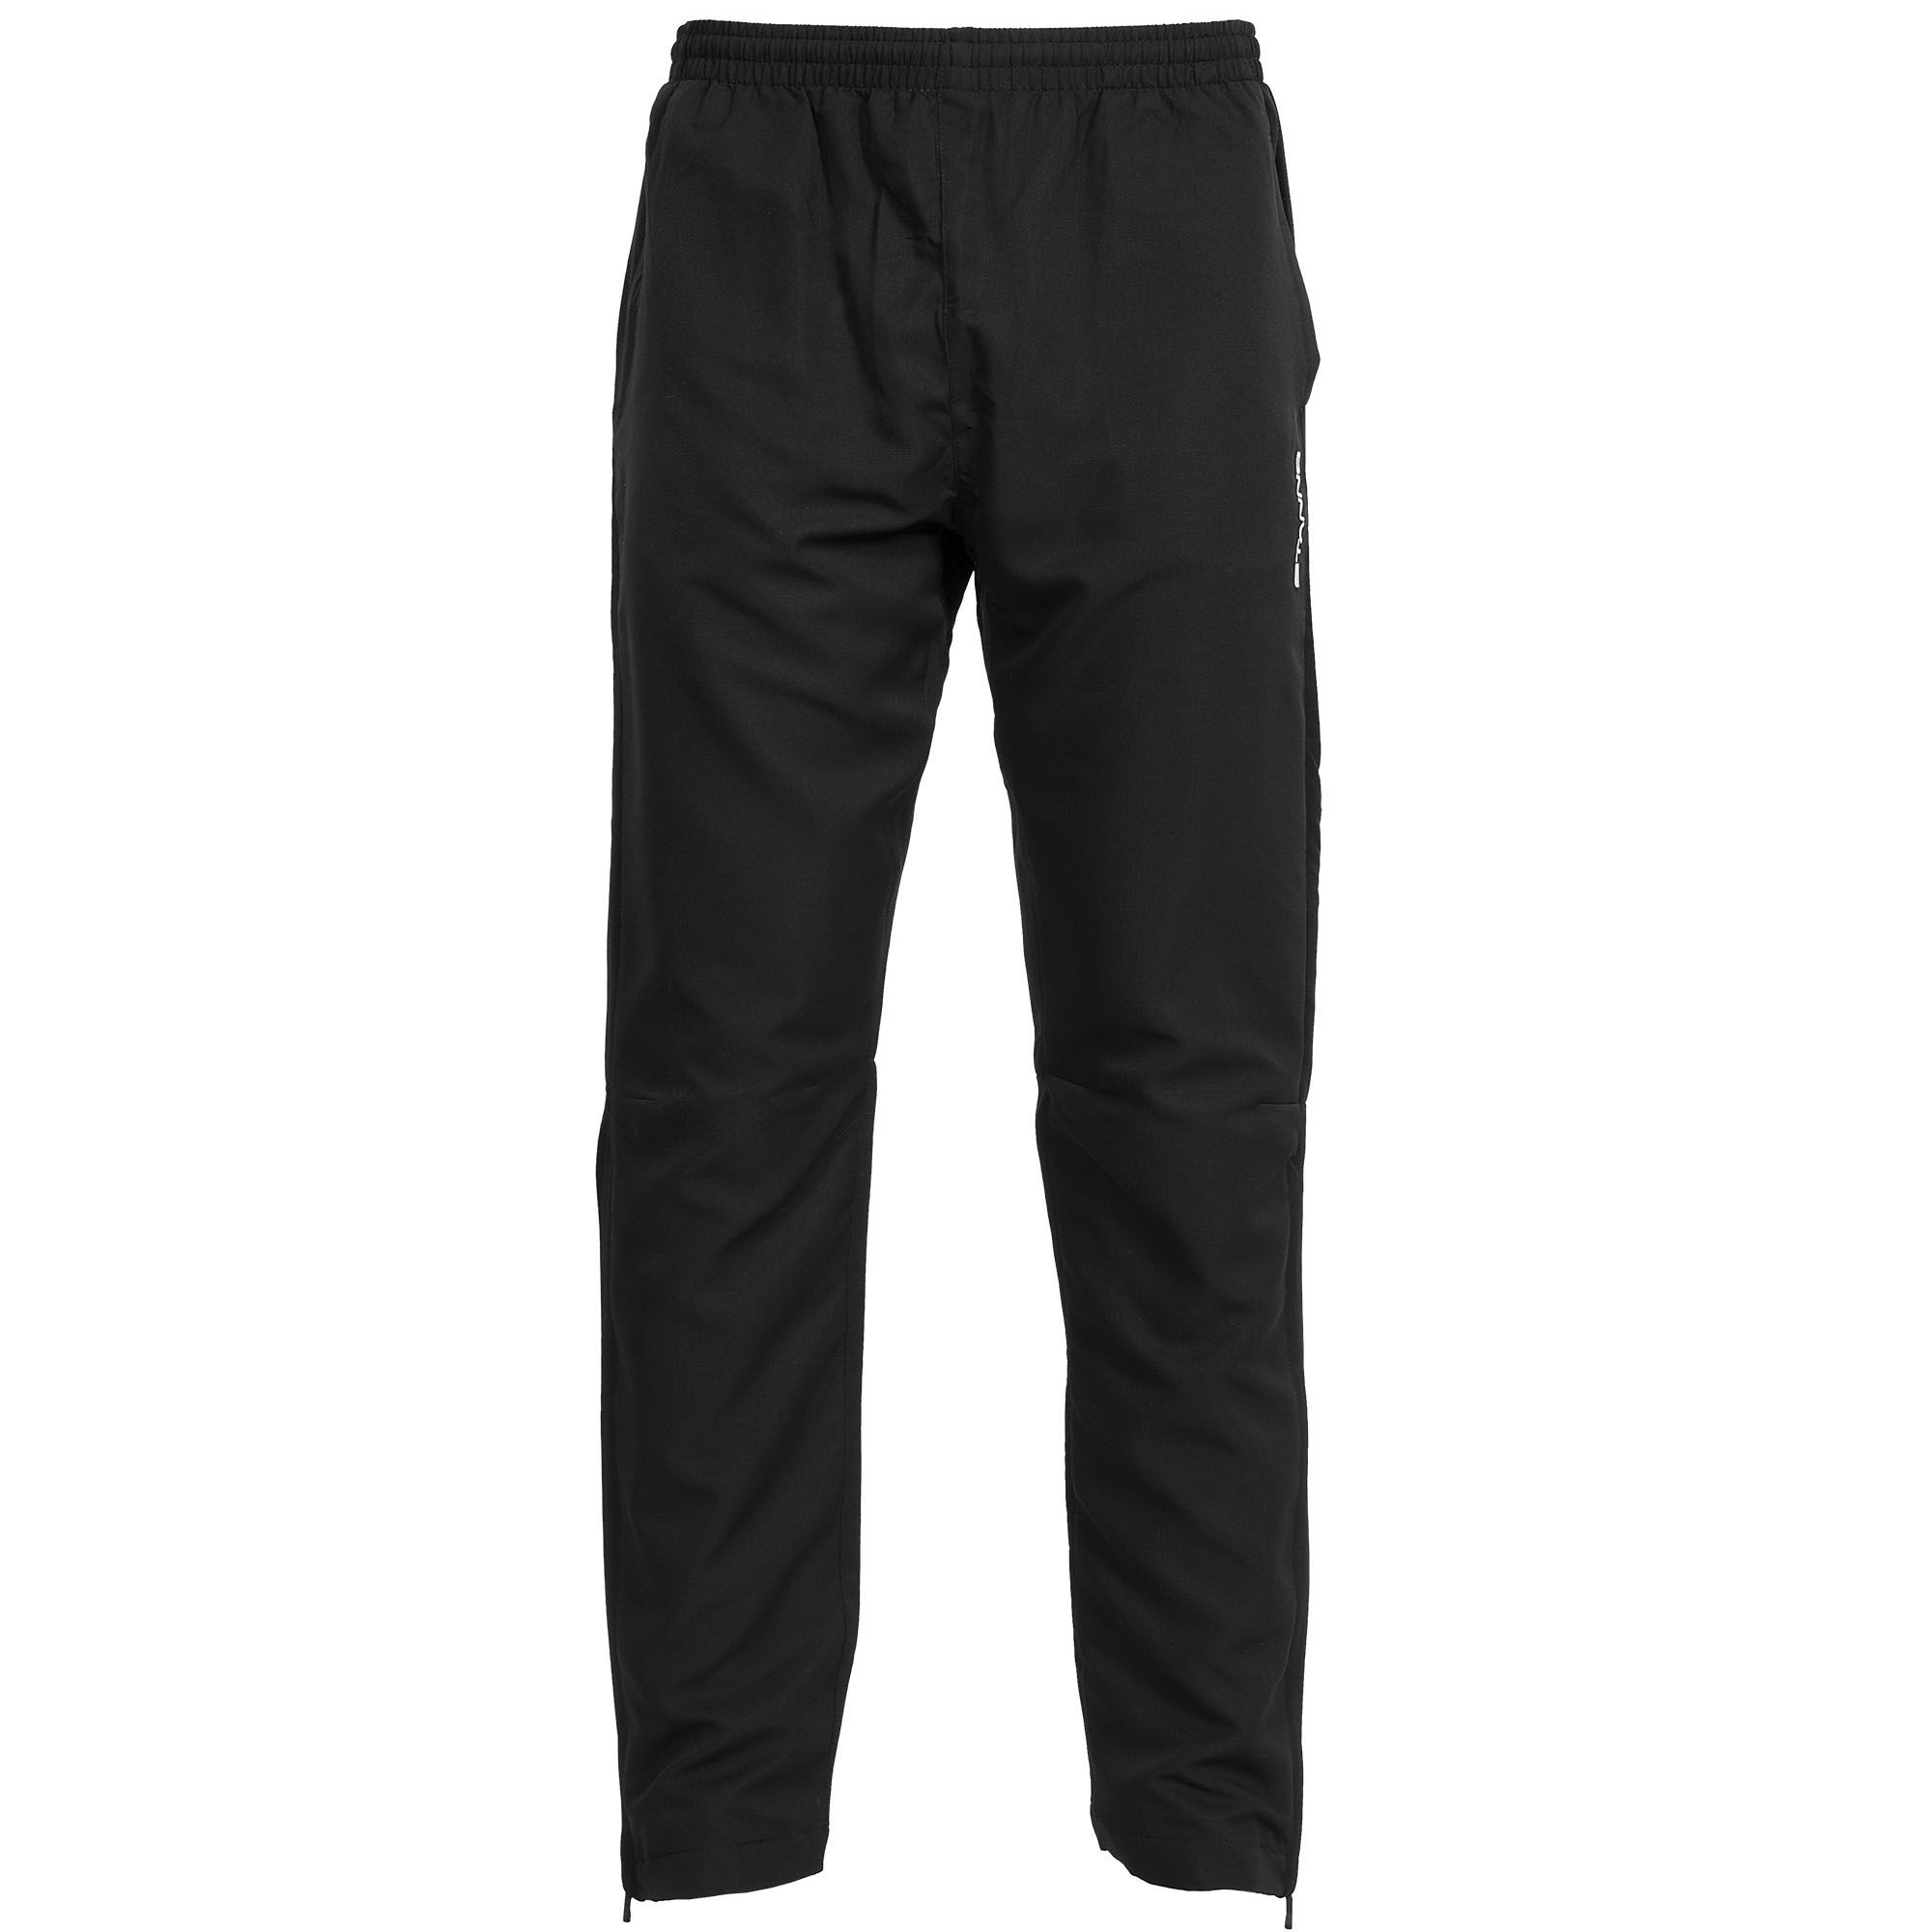 STANNO CENTRO MICRO spodnie sportowe męskie